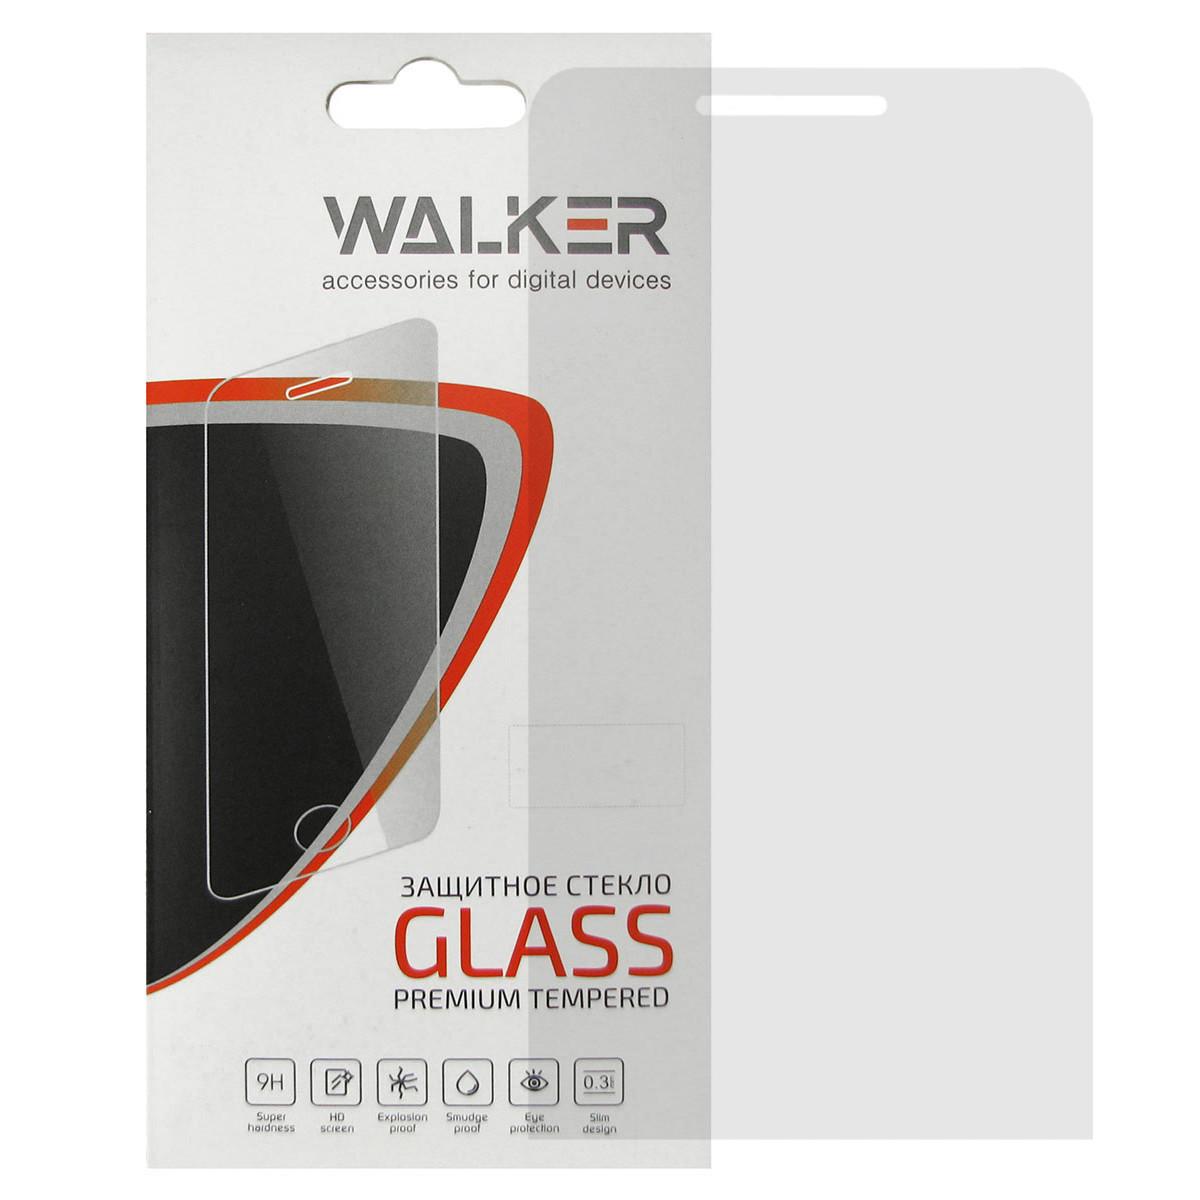 Защитное стекло Walker 2.5D для Asus Zenfone GO (ZC500TG) (arbc8049)